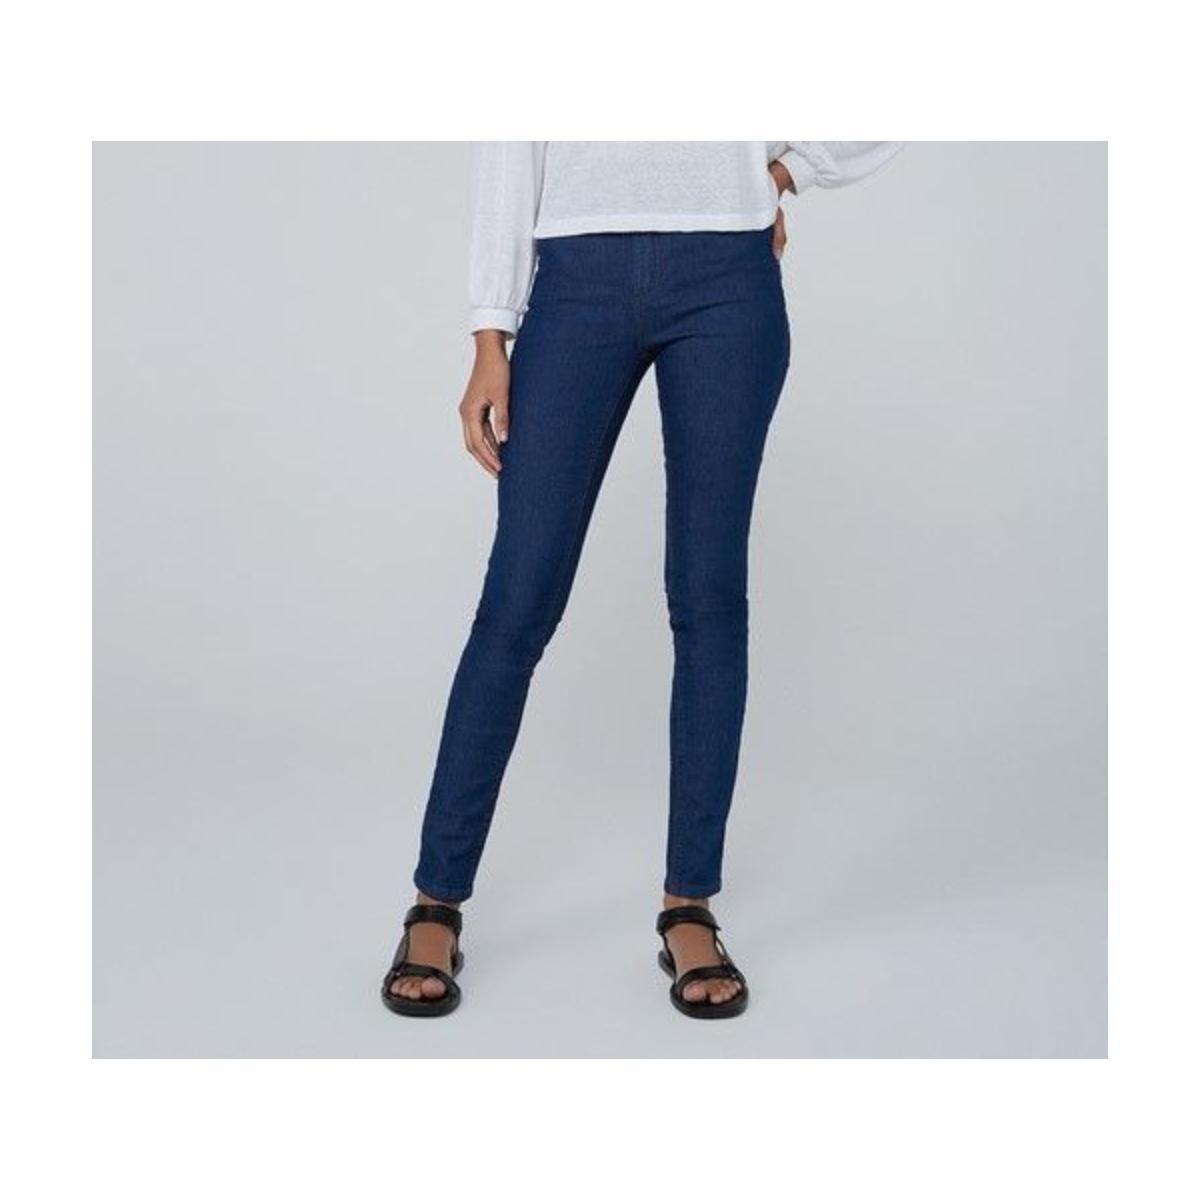 Calça Feminina Dzarm Zu5v 1asn Jeans Escuro